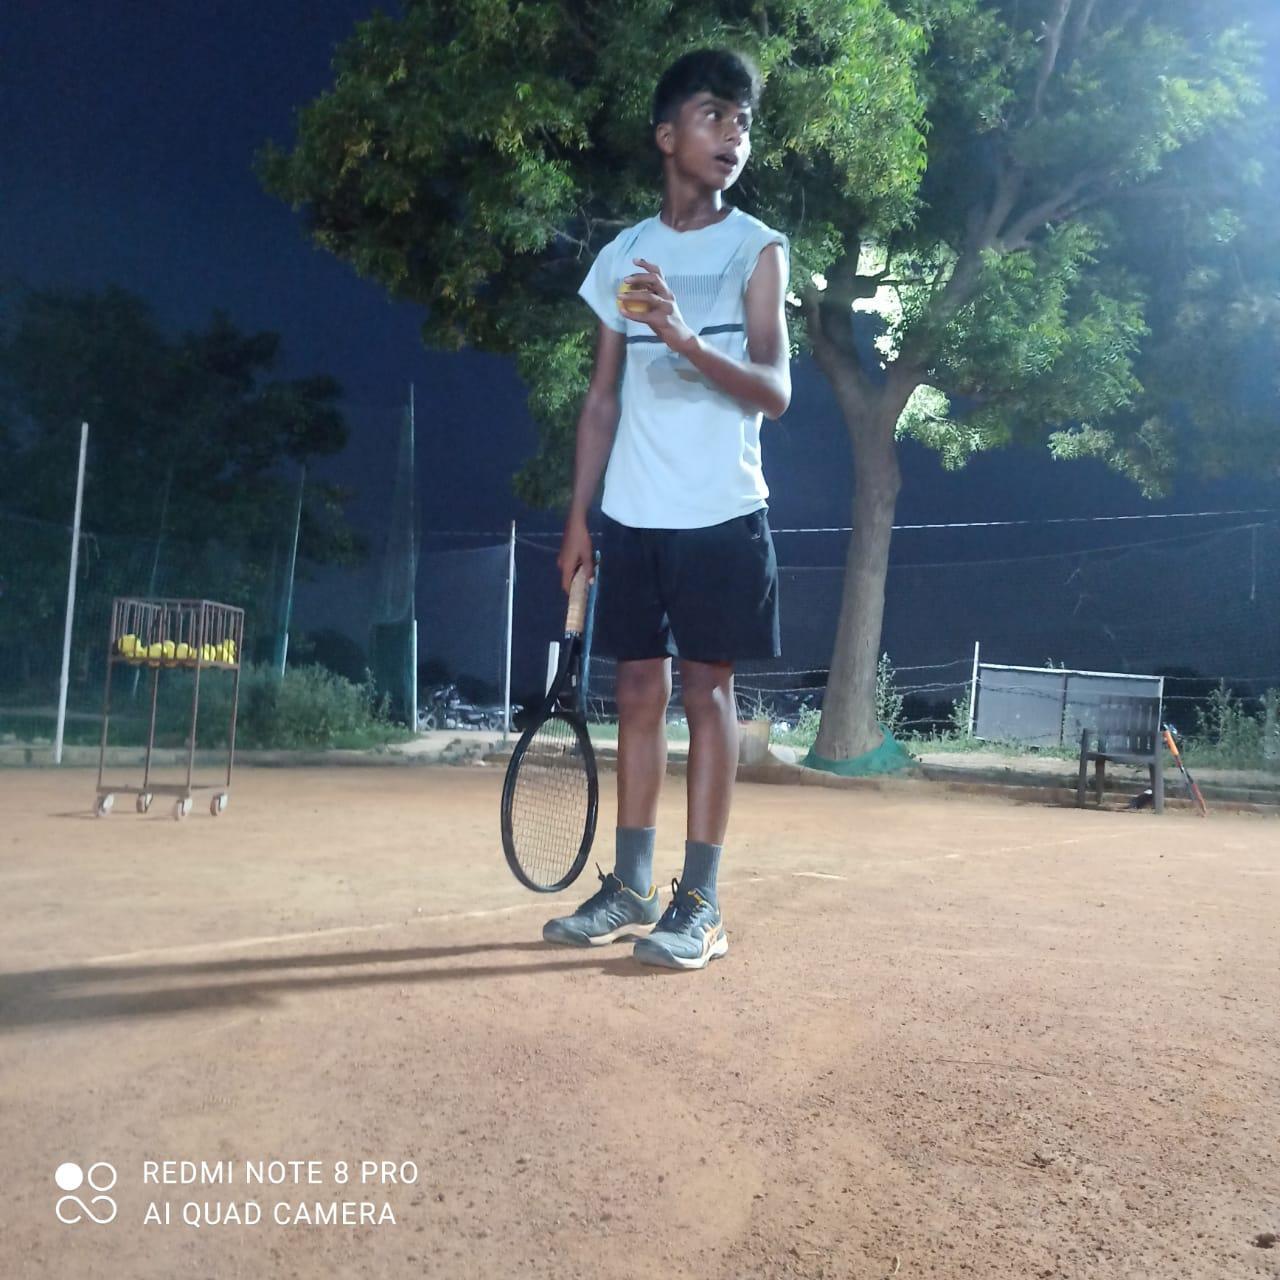 Krishna Sharrma young lawn tennis player in Ghaziabad